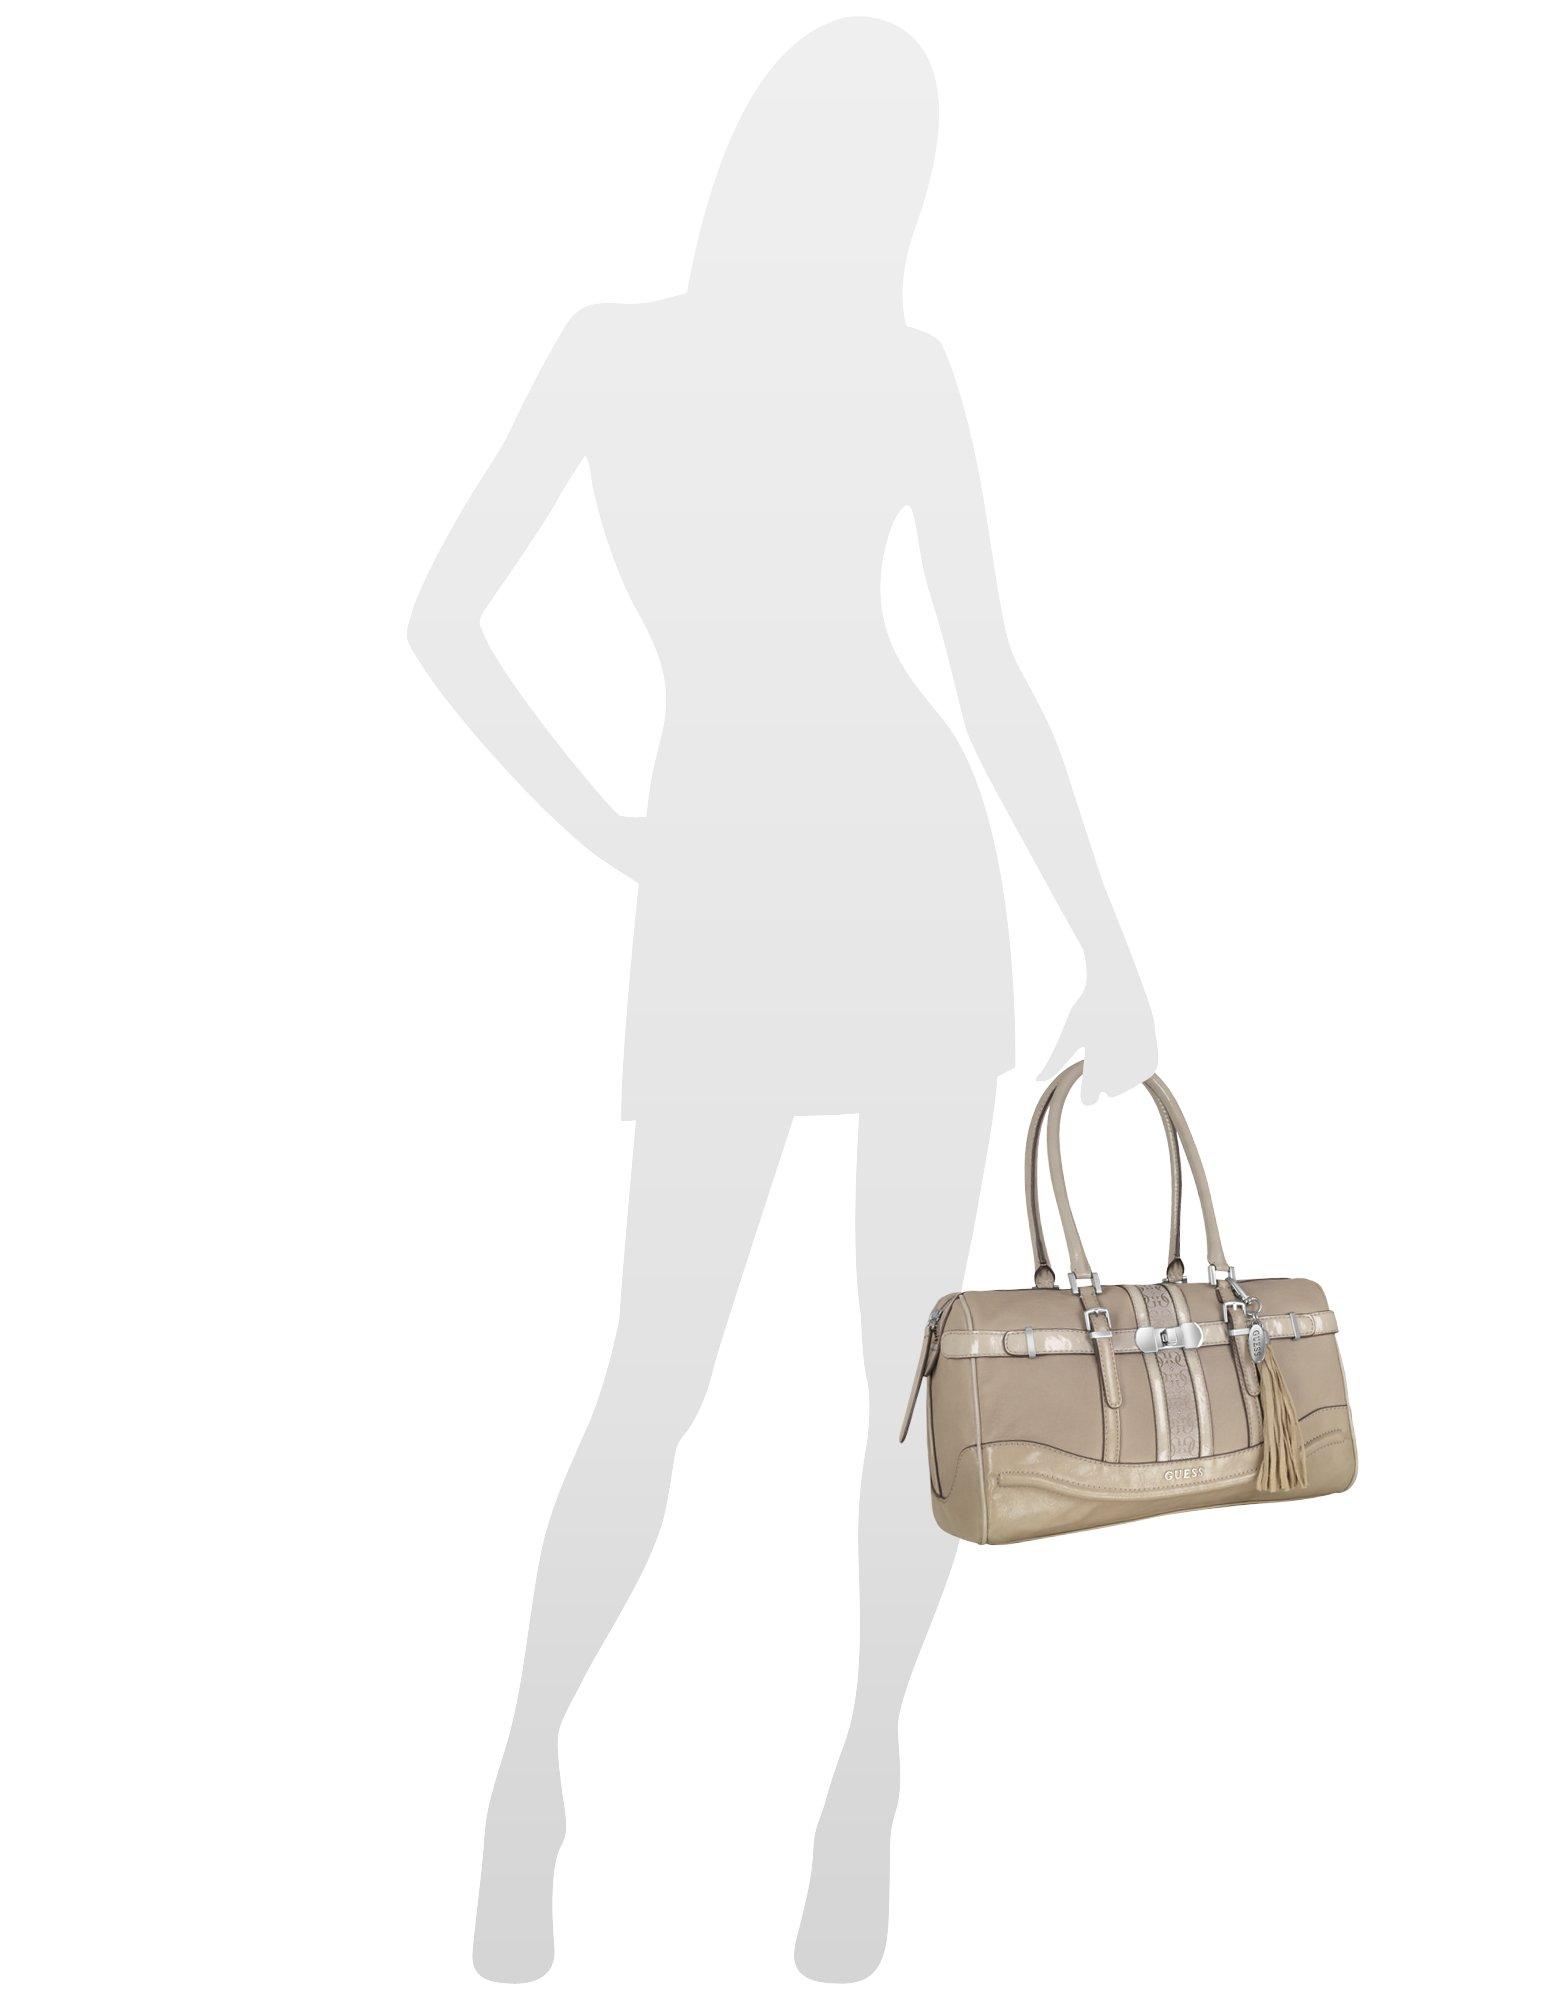 Lyst - Guess Scent City - Box Satchel Bag in Natural e045dac1296e7